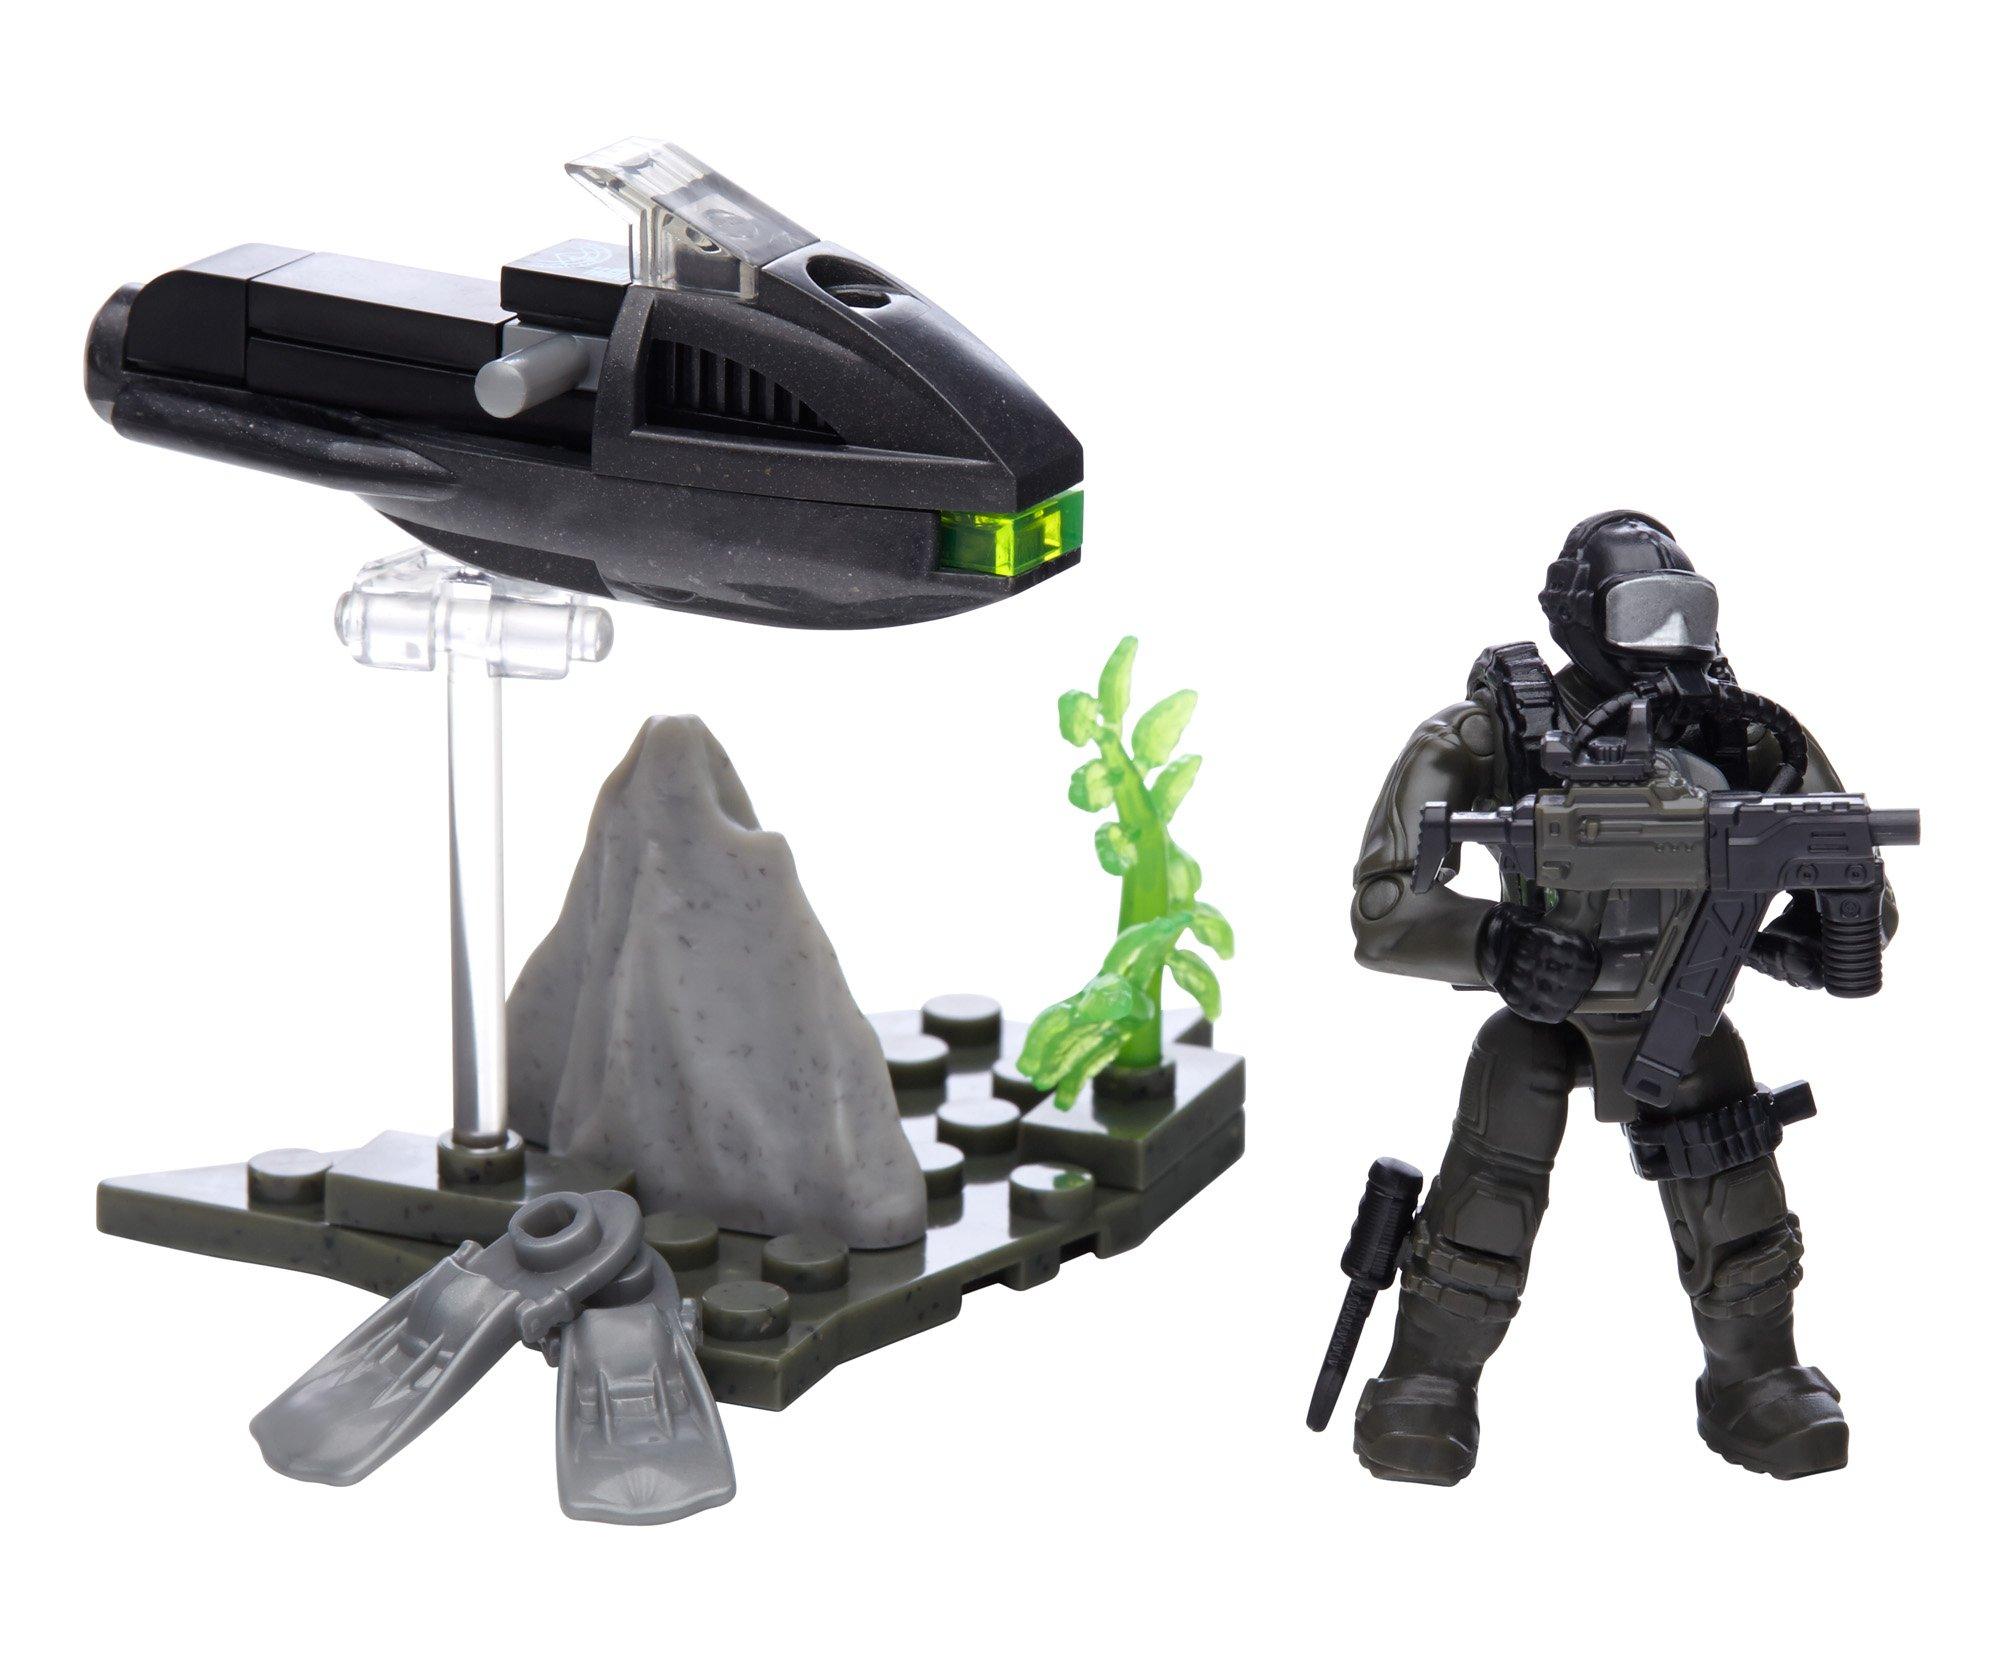 Mega Bloks Call of Duty Seal Specialist Building Kit